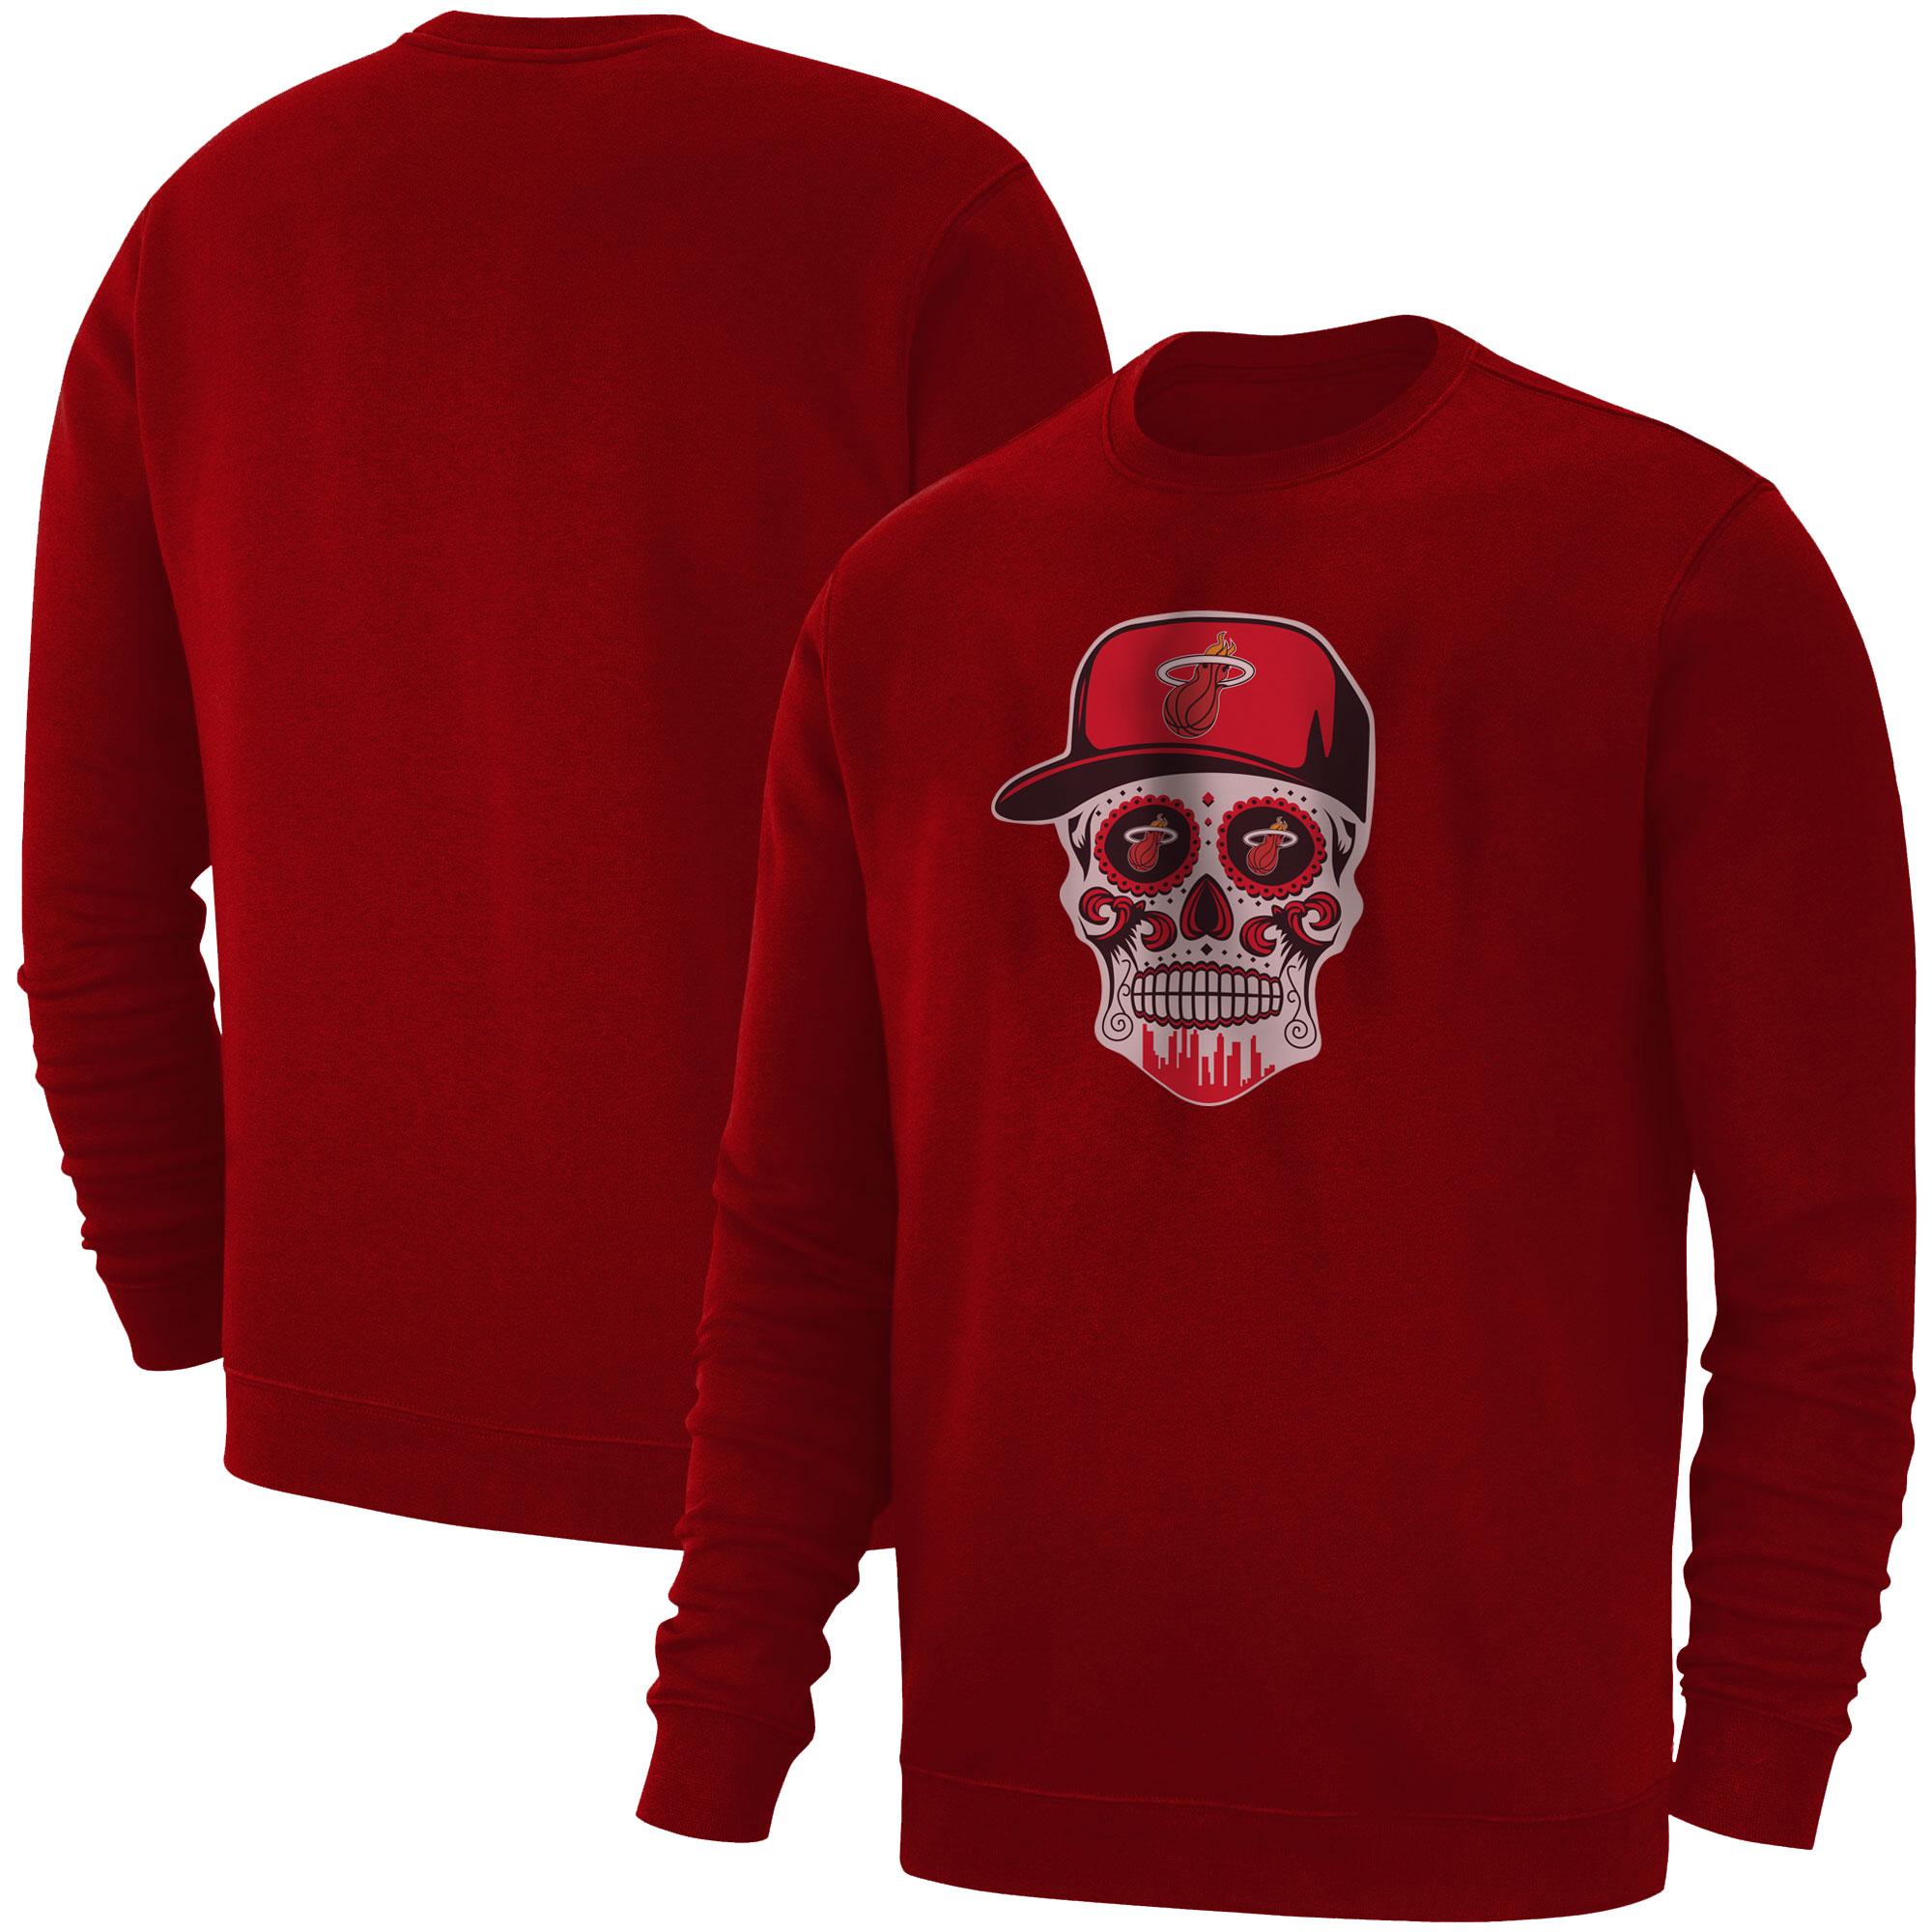 Heat Skull Basic (BSC-RED-NP-456-NBA-MIAMI-SKULL)